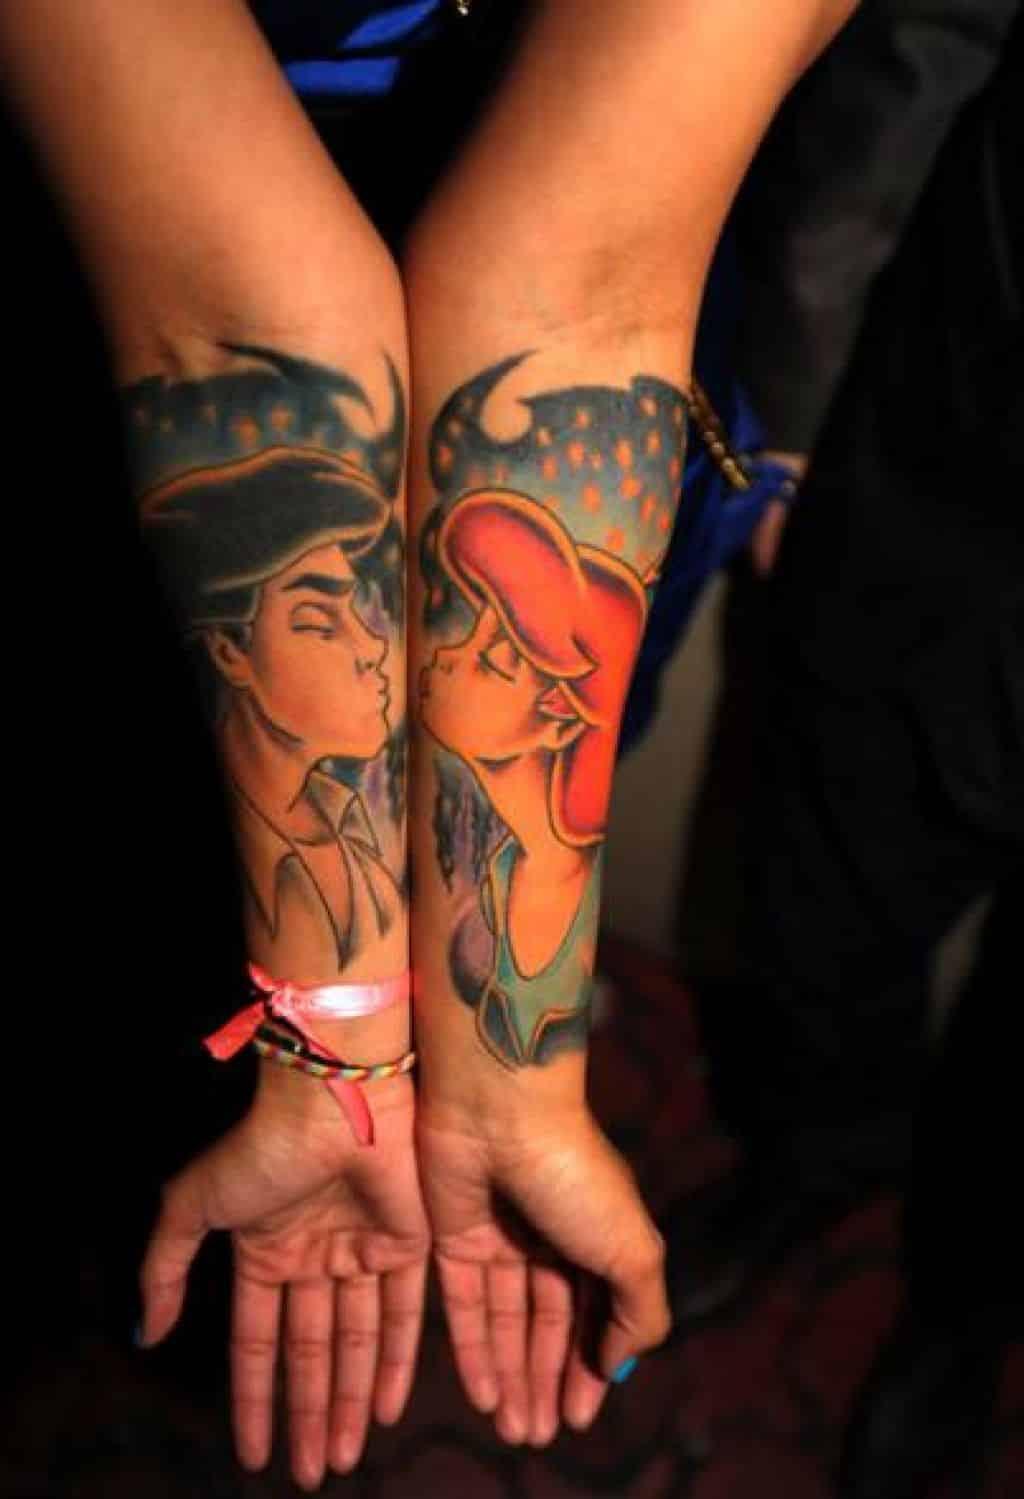 couple-tattoos-the-little-mermaid - Tattoo Bytes